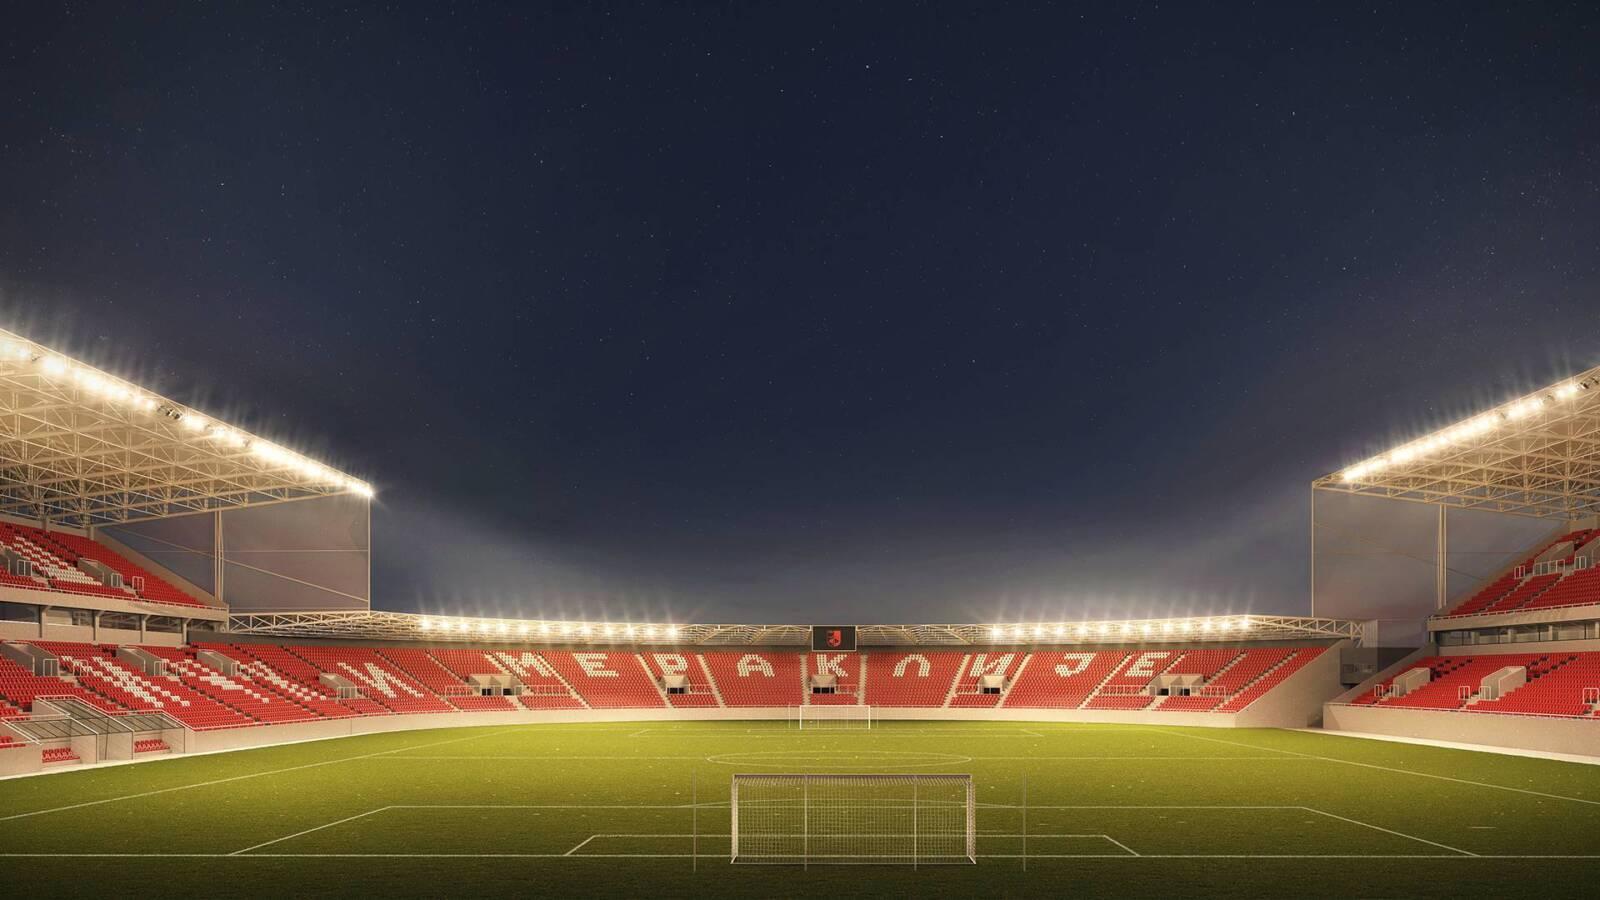 Stadion-Cair-Nis-1-Kapaprojekt-